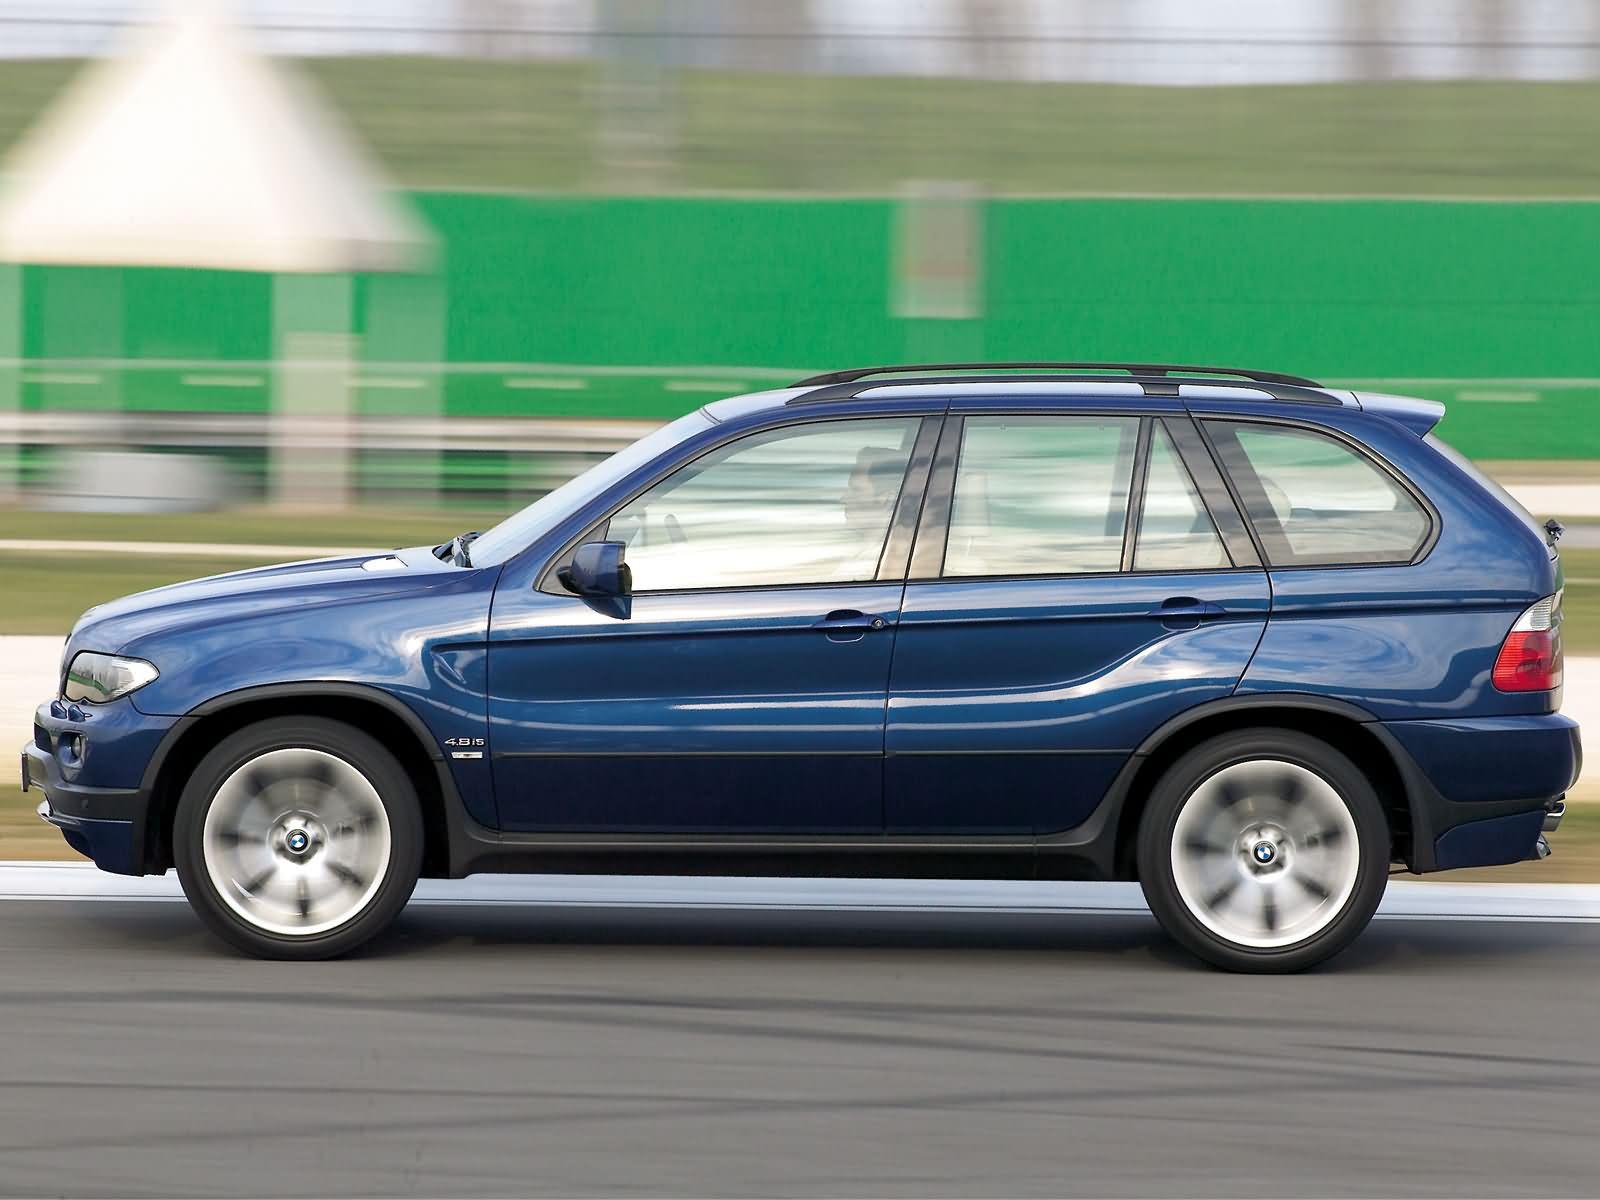 BMW-X5-E53-3.jpg